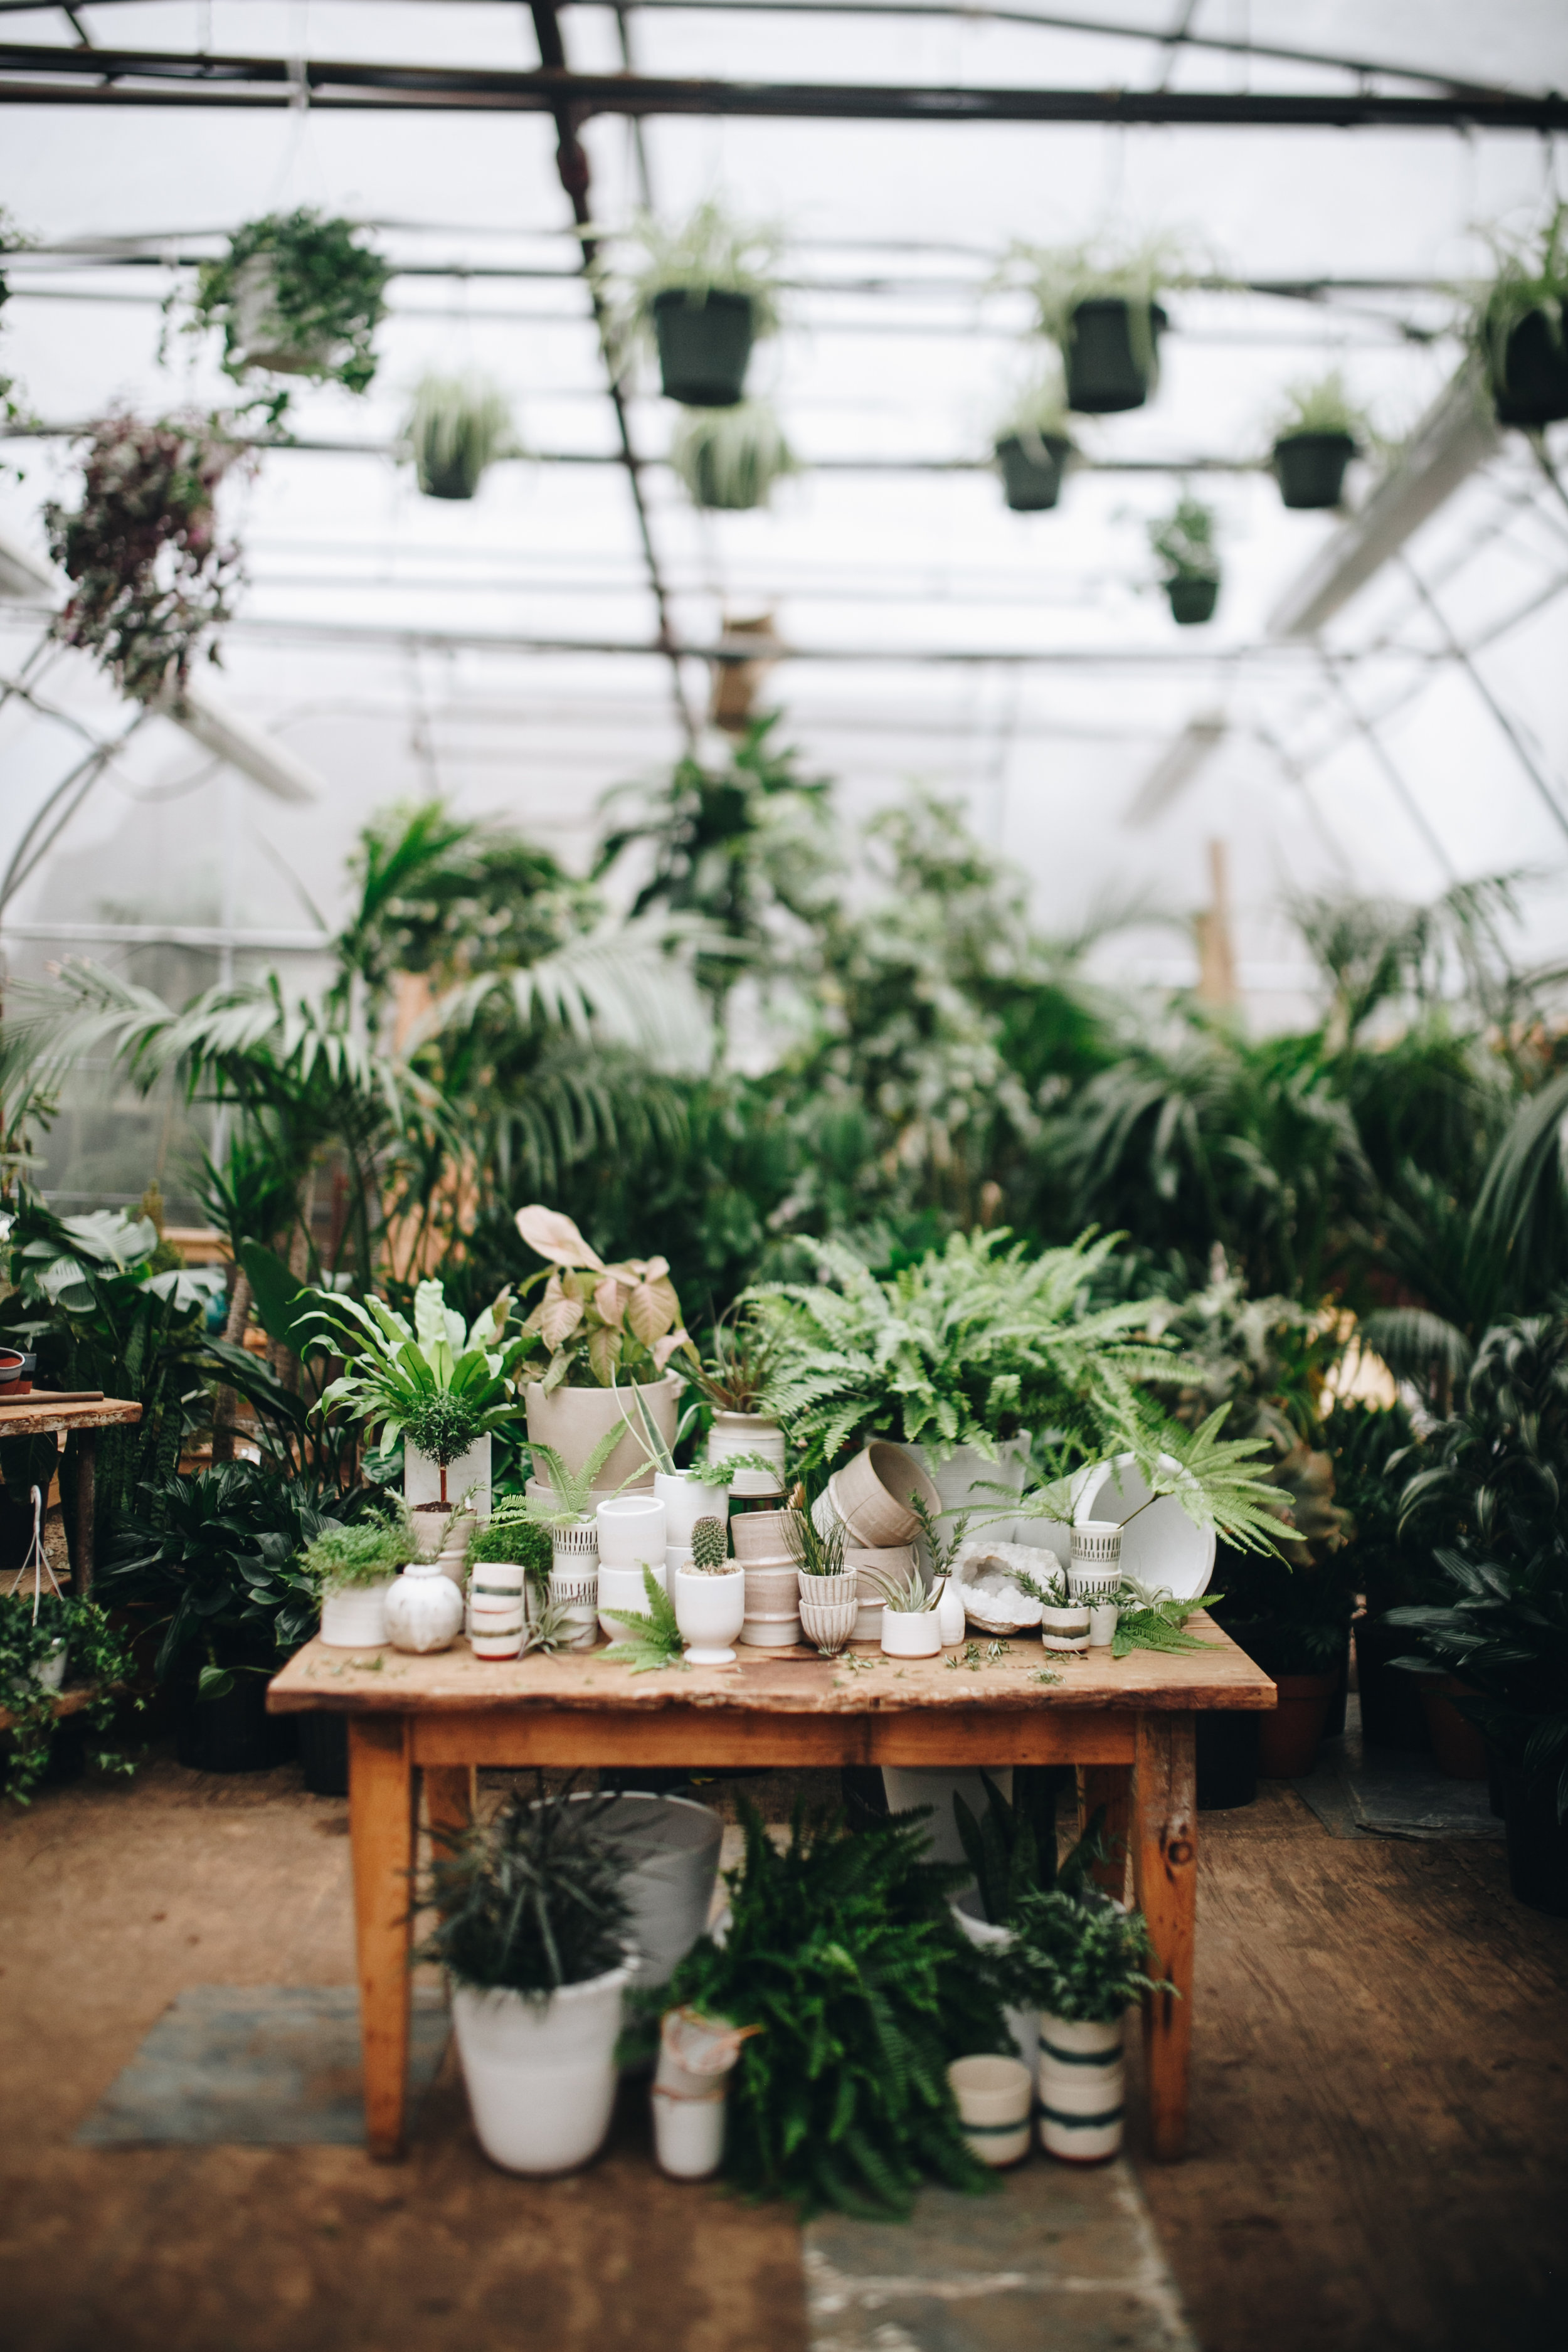 plantshed-9169.jpg